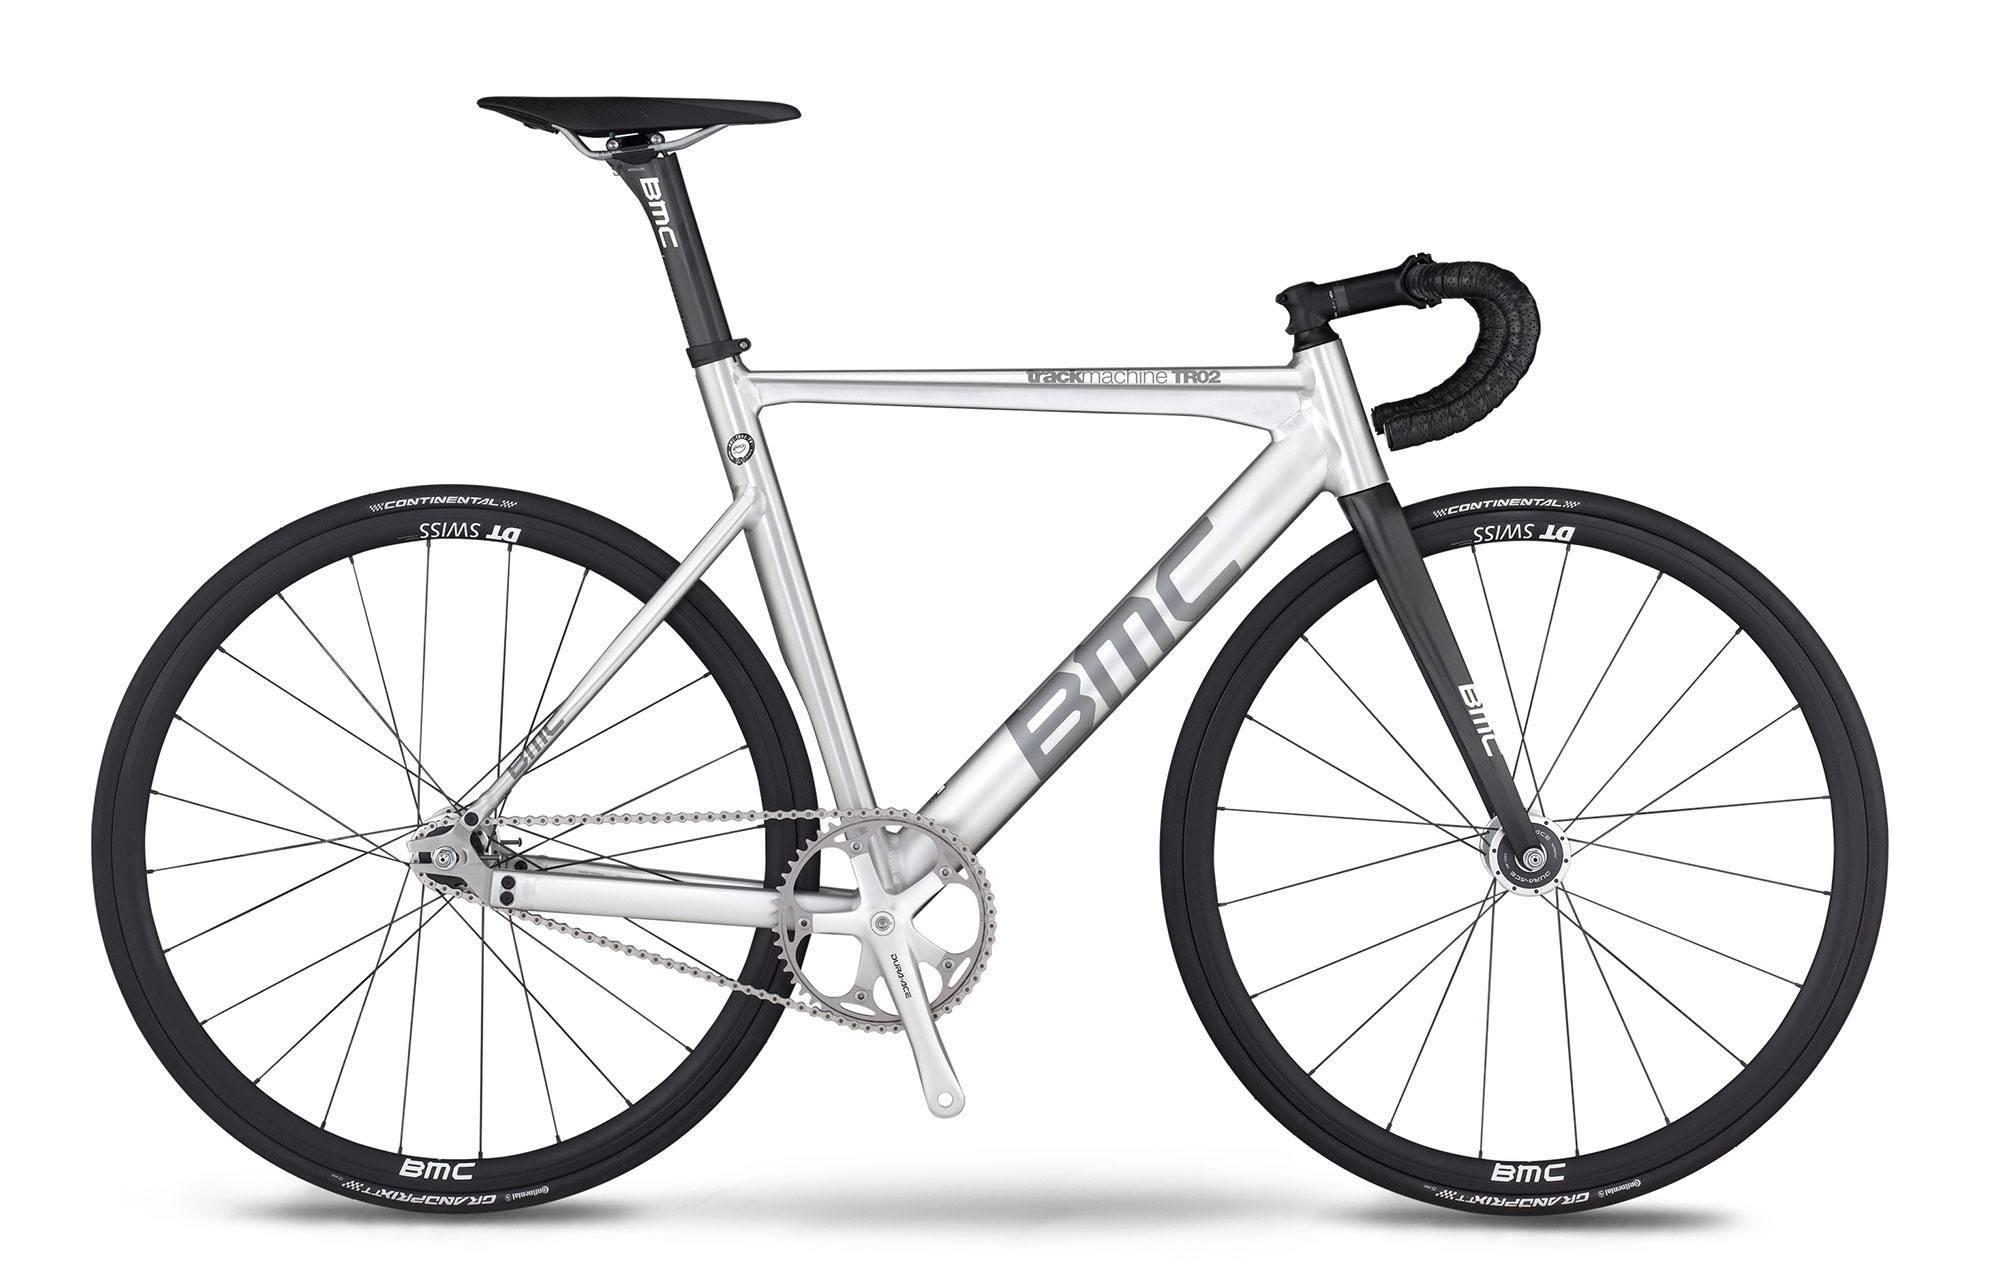 Bmc Trackmachine Tr02 Dura Ace Bike